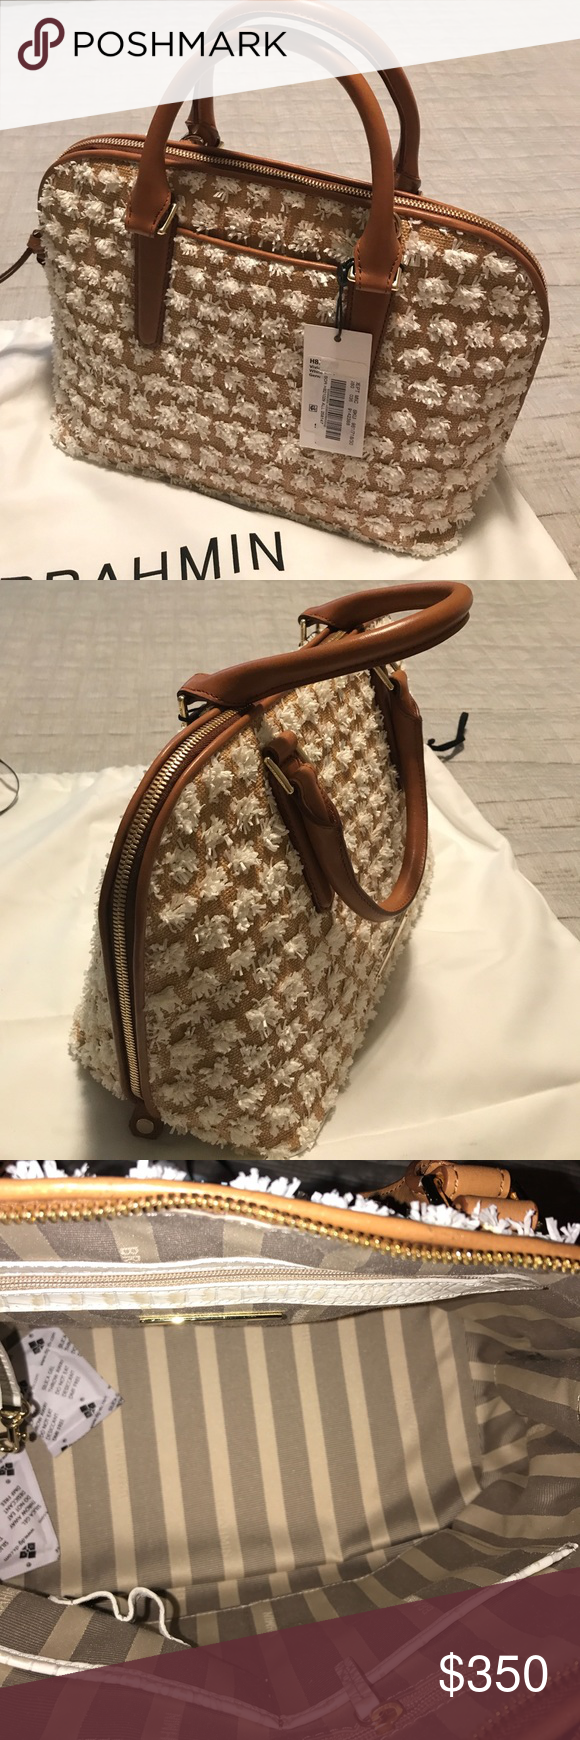 Brahmin bag( authentic) New with tags Brahmin Vivian - white Bora bag. Brahmin  Bags Satchels 11784bf19c